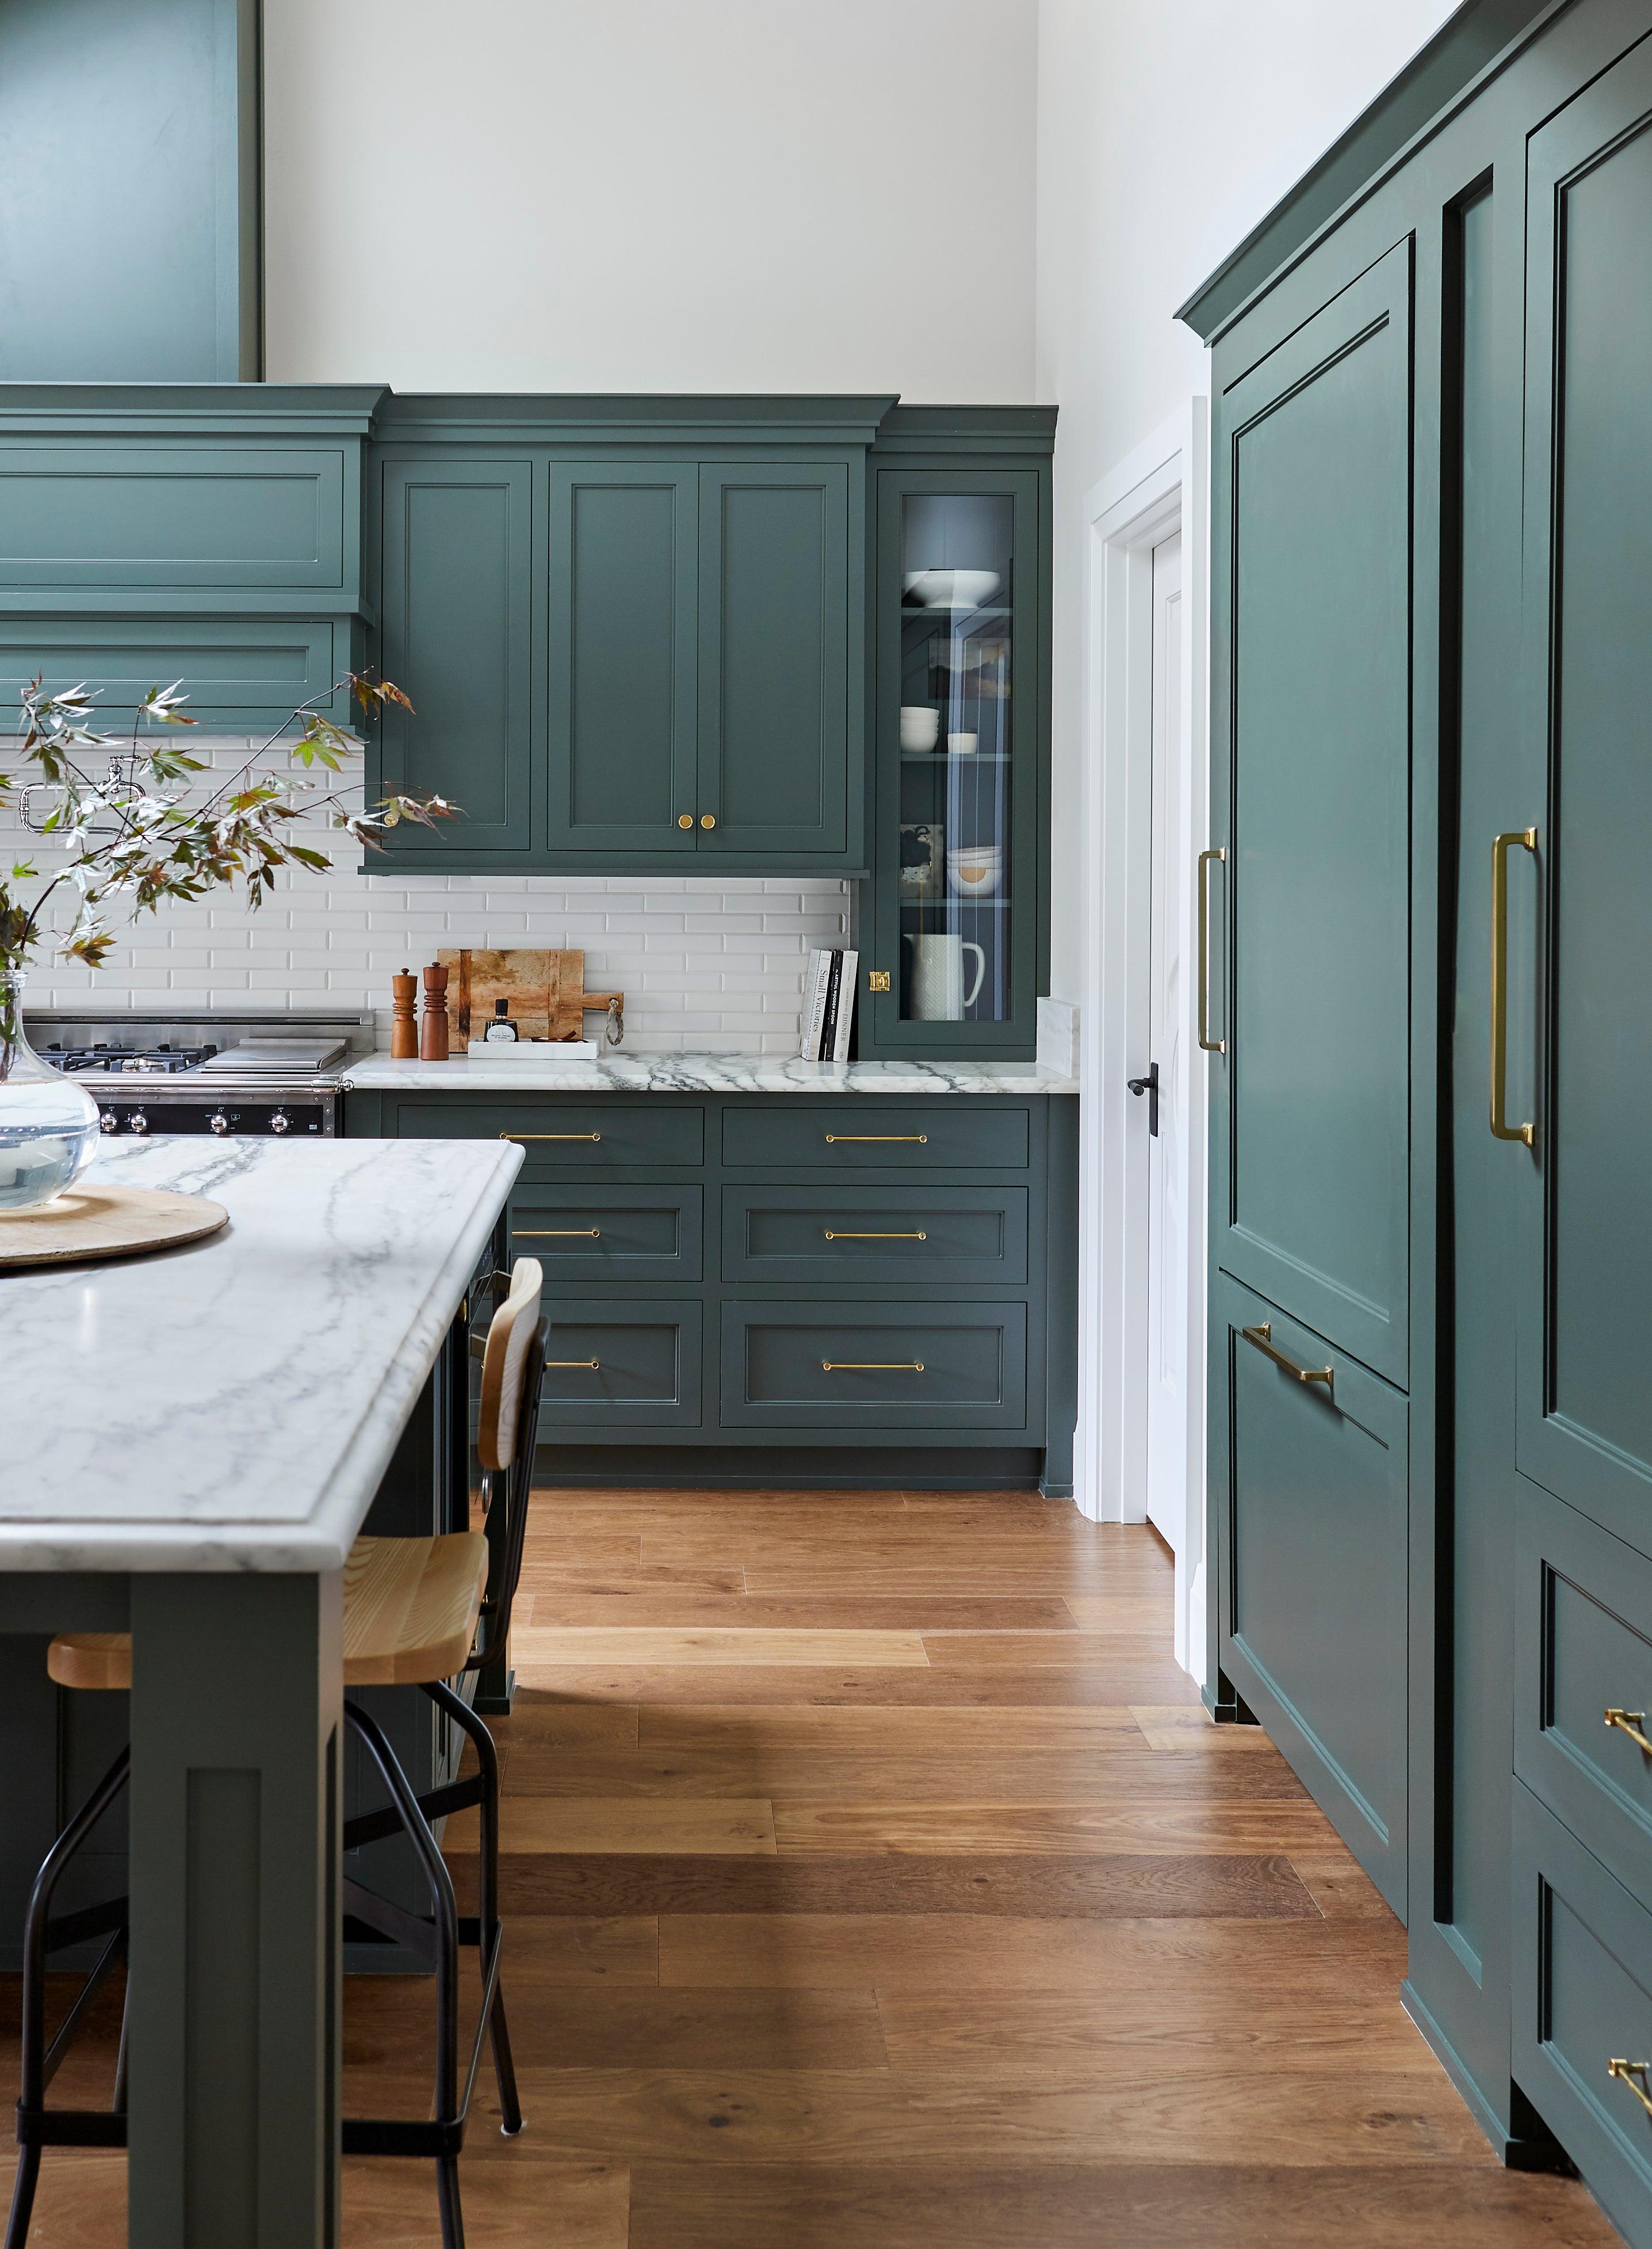 11 Green Kitchen Cabinet Paint Colors, Best Gray Green Paint For Kitchen Cabinets